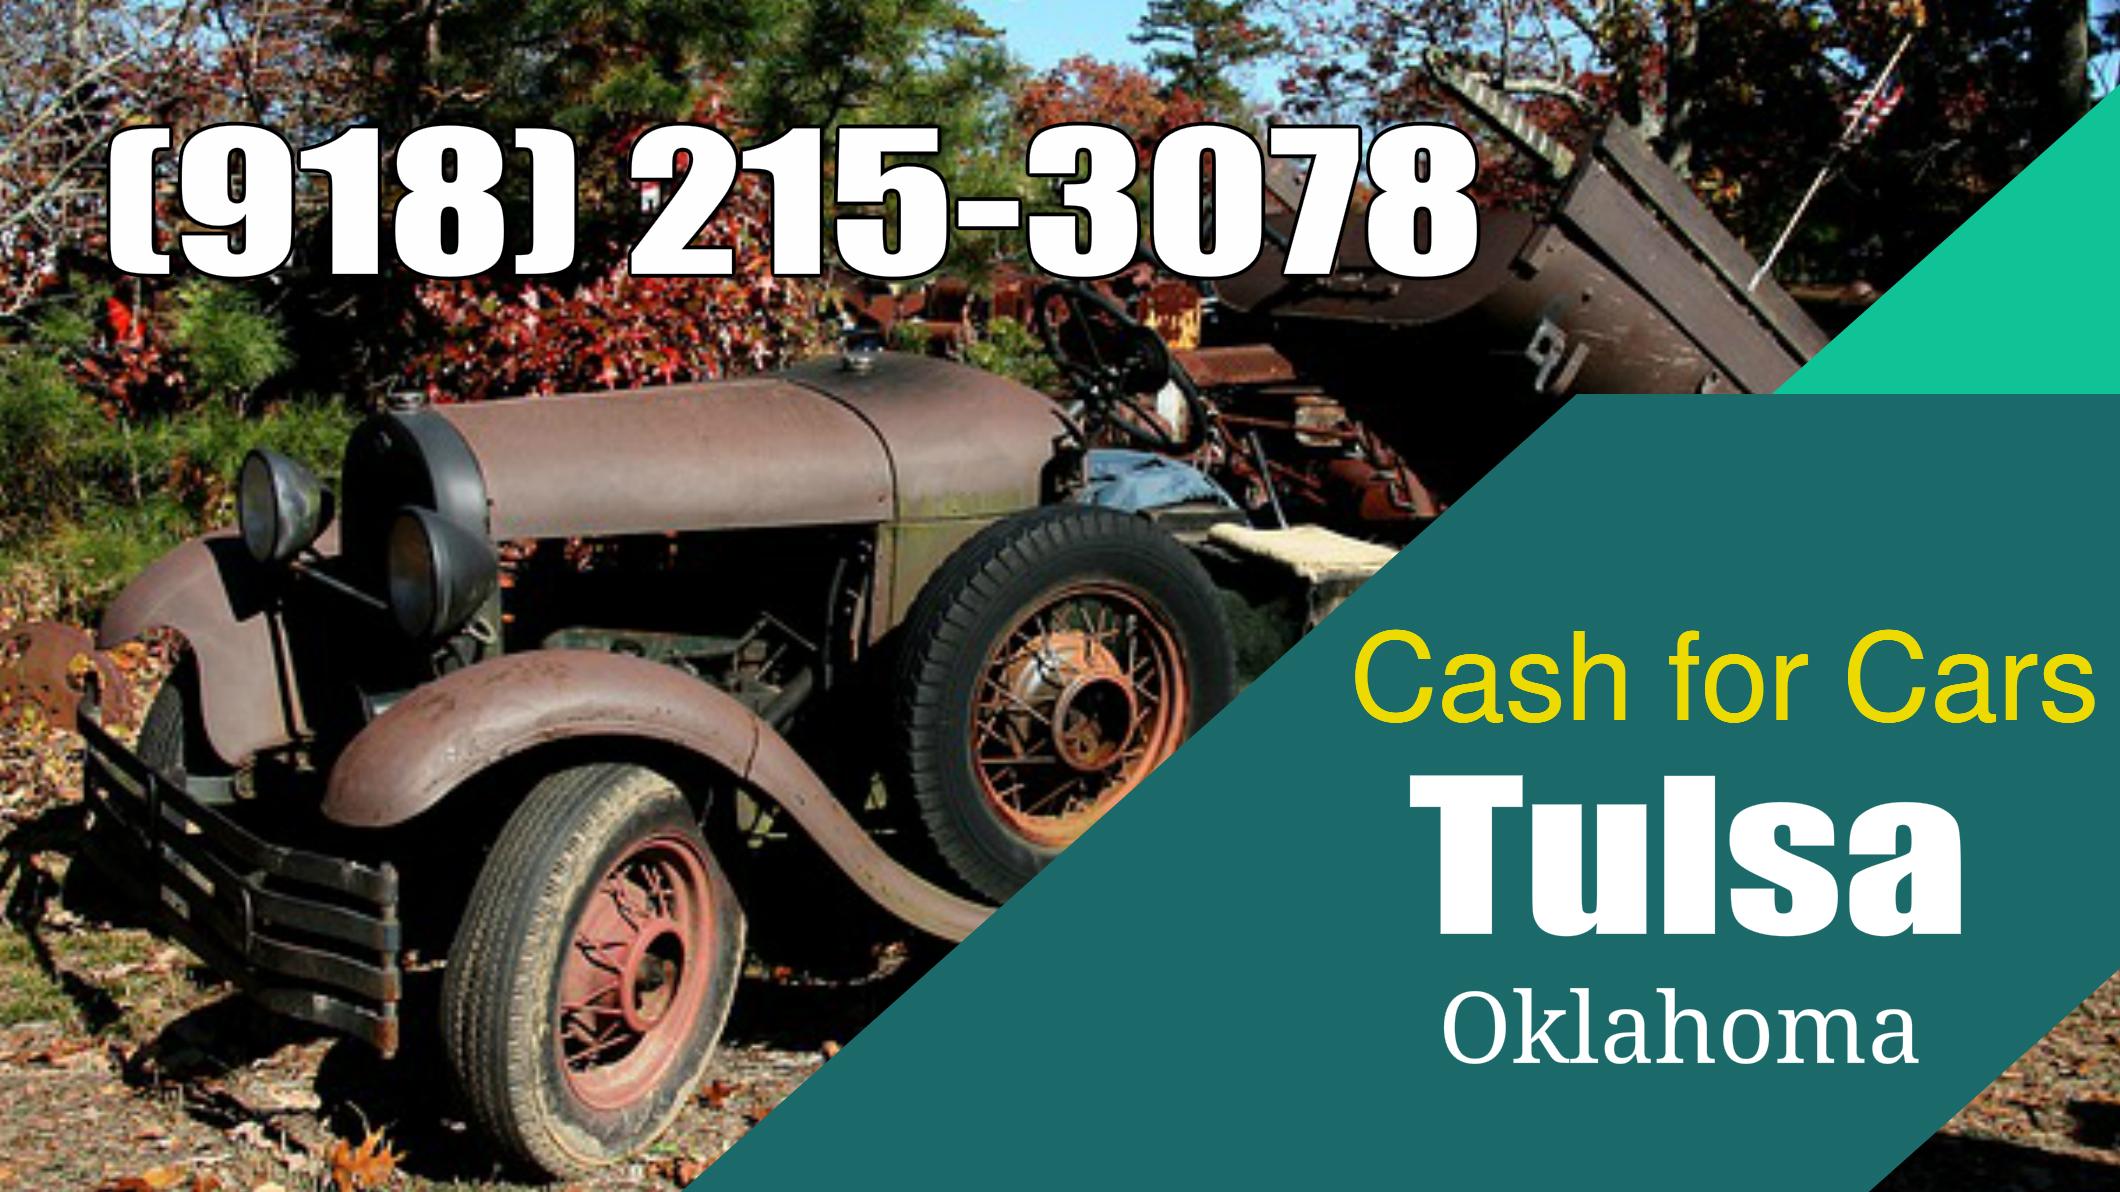 Cash For Cars Tulsa OK (918) 215-3078